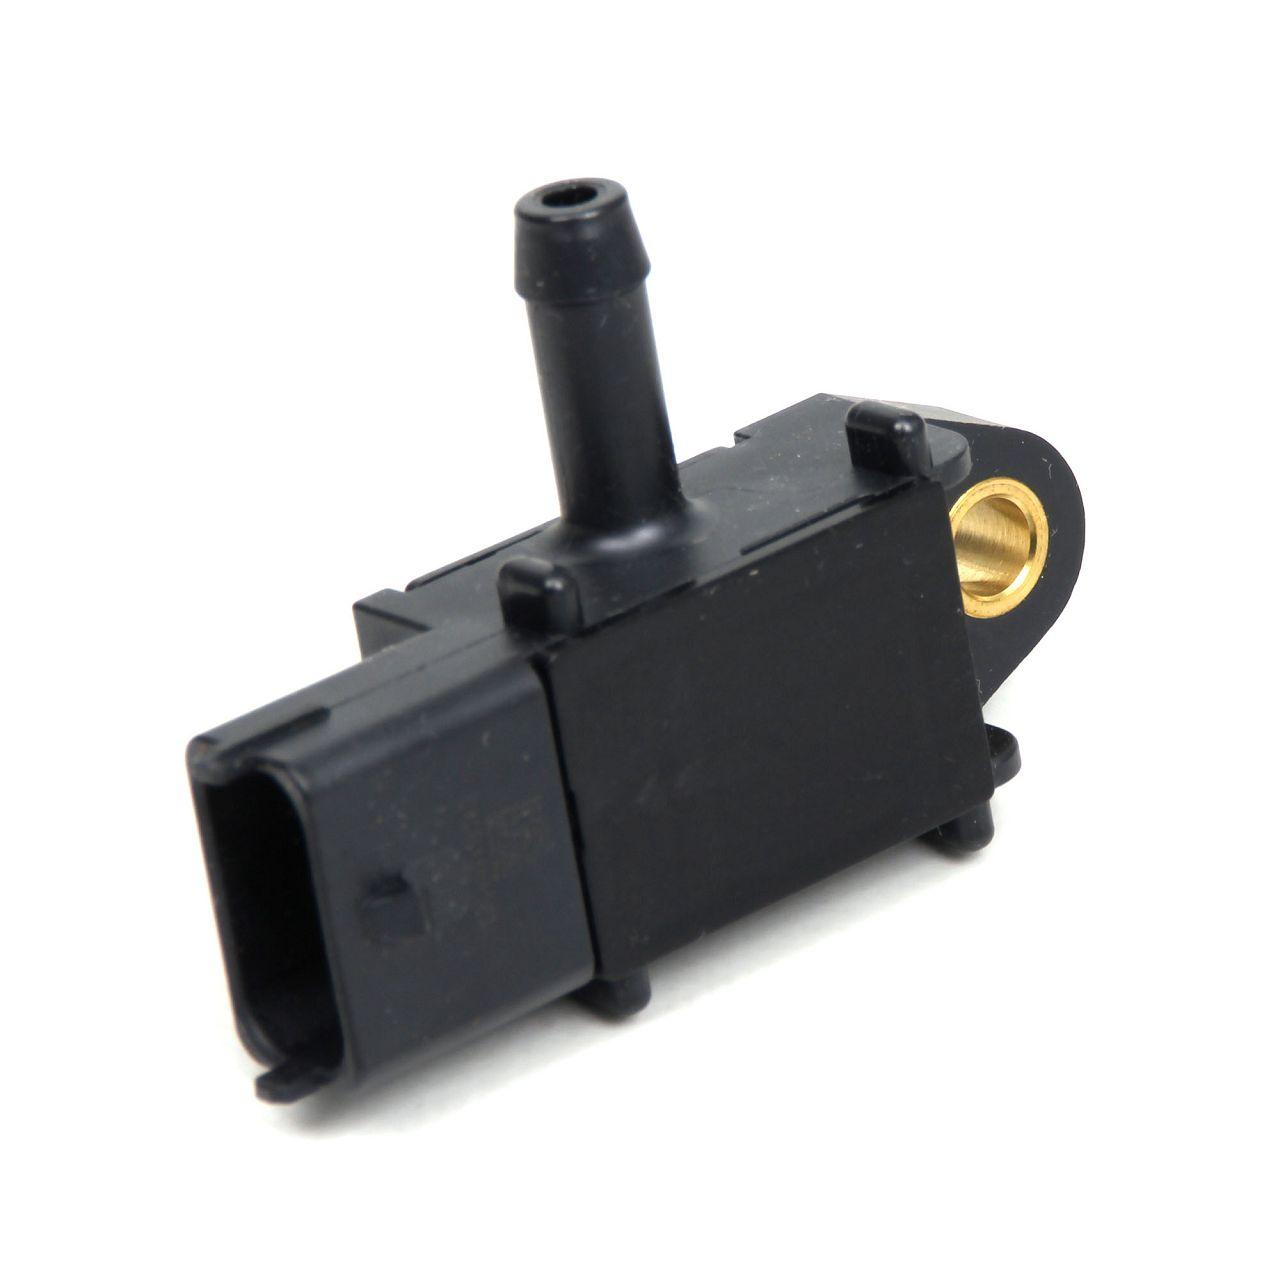 Abgasdrucksensor Drucksensor OPEL Astra H J Corsa D Insignia Zafira B C 862040